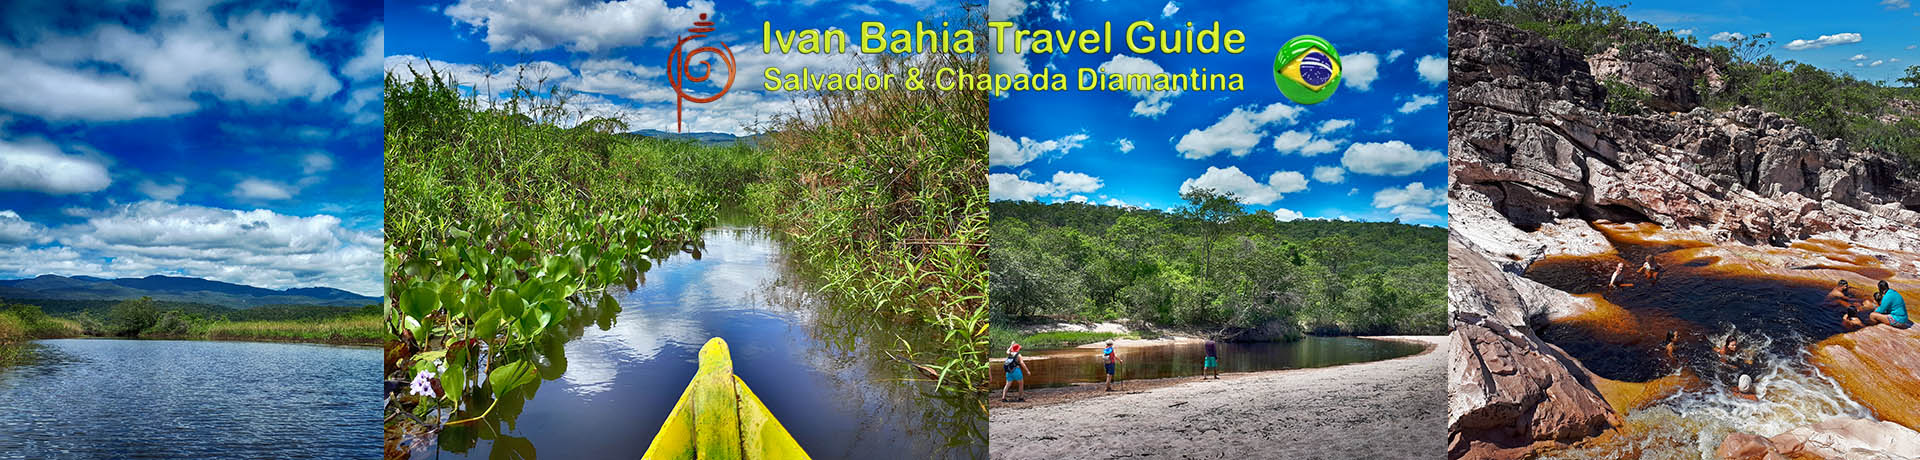 Ivan Bahia & Chapada Diamantina guide / Parc National Chapada Diamantina (connu comme le 'Grand Canyon Brésilien') / #ibtg #ibg #ivanbahiaguide #ivanbahiatravelguide #zenturturismo #ivanchapadadiamantinaguide #valedopati #patyvalley #pati #viapati #valecapao #ivanchapadaguide #chapadadiamantinatransfer #chapadatrekking #chapadaroots #chapadasoul #lencoisbahia #chapadadiamantinatrekking #ivanchapadadiamantinaguide  #chapadadiamantinaguide  #guidechapadadiamantina #lencois #lençois #chapadaadventuredaniel #diamondmountains #zentur # #guiachapadadiamantina #chapadaaventure #discoverchapada #chapadadiamond #chapadasoul #diamantinatrip  #tripadvisor #bahiametisse, #fernandobingre, #ivansalvadorbahia #salvadorbahiaTravel #toursbylocals #fotosbahia #bahiafotos #chapadadiamantinanationalpark #yourtoursbrazil #maurotours #bahiatopturismo #bahiapremium #maisbahiaturismo  #cassiturismo